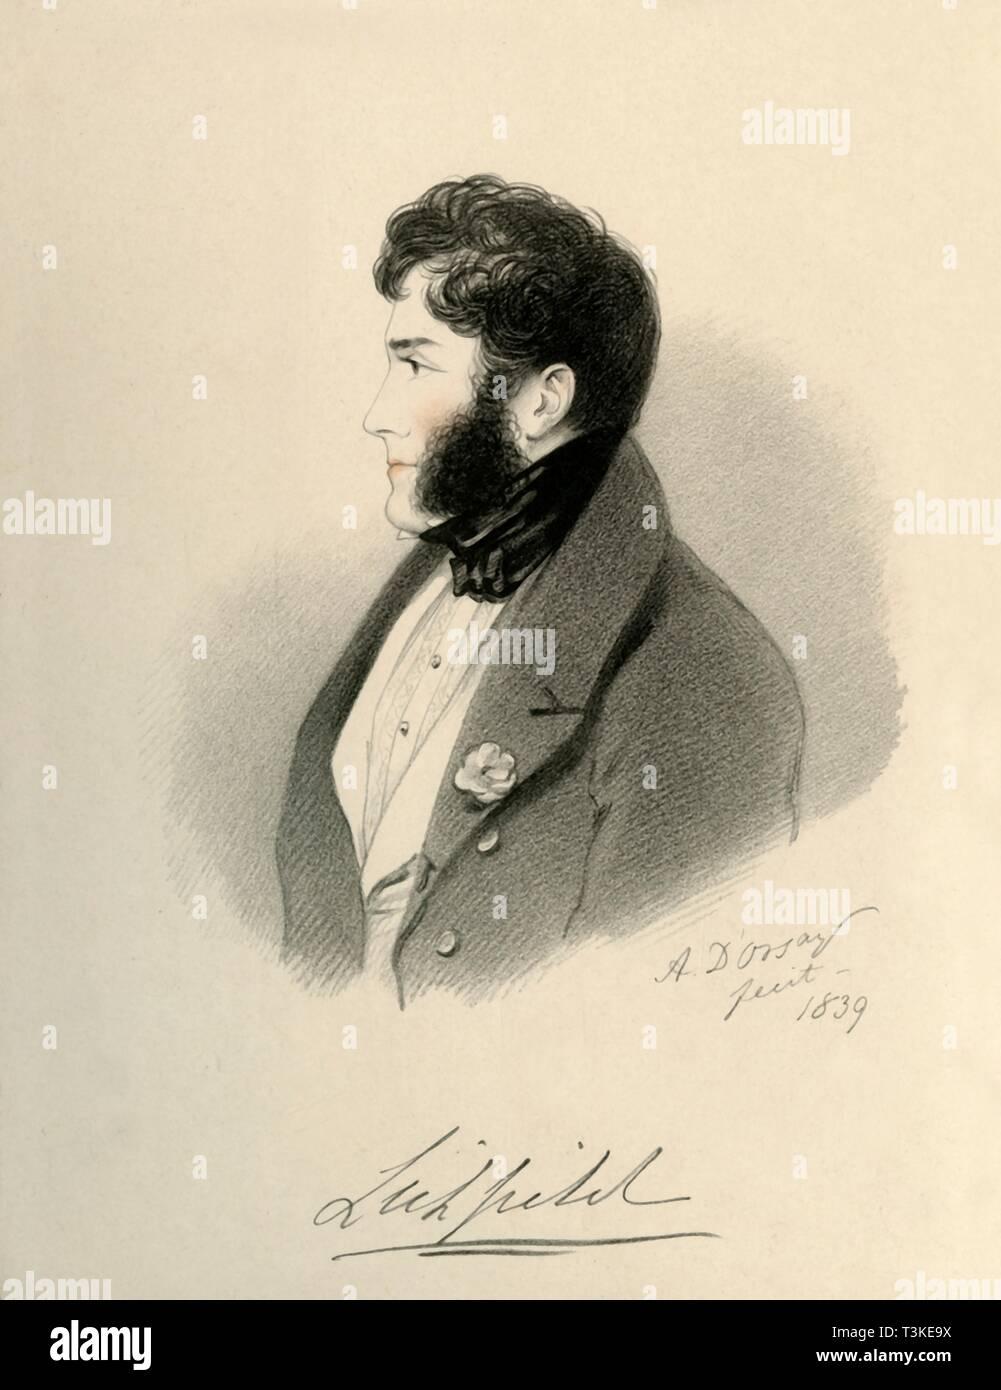 'Earl of Lichfield', 1839. Creator: Richard James Lane. - Stock Image